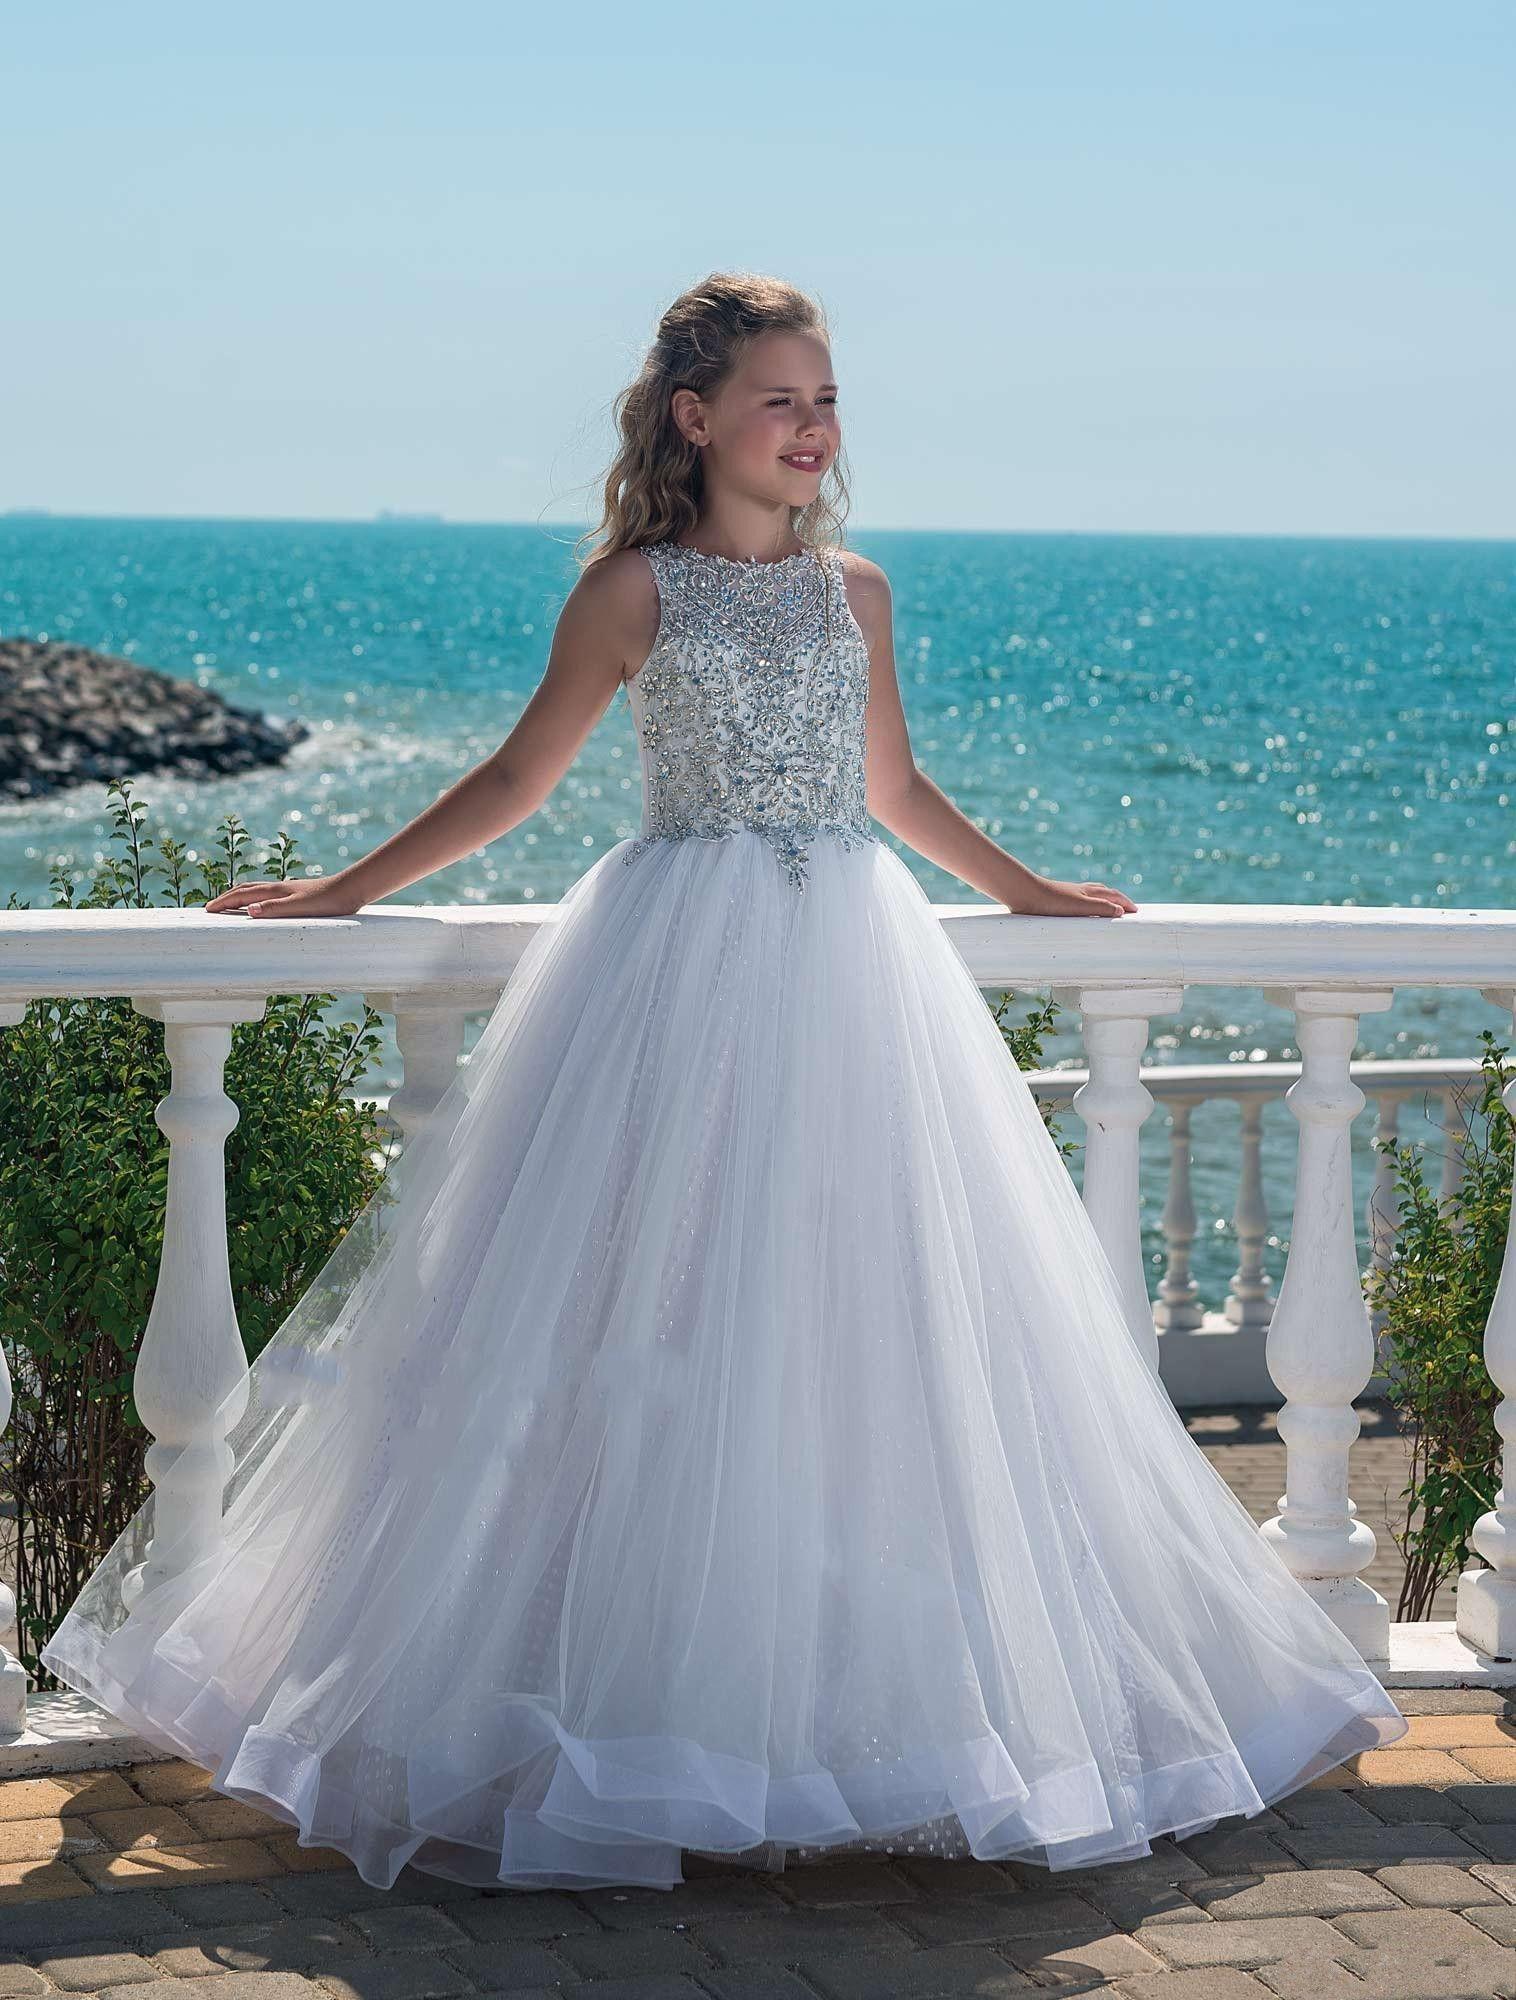 Magnificent Michaelangelo Wedding Dresses Image - All Wedding ...